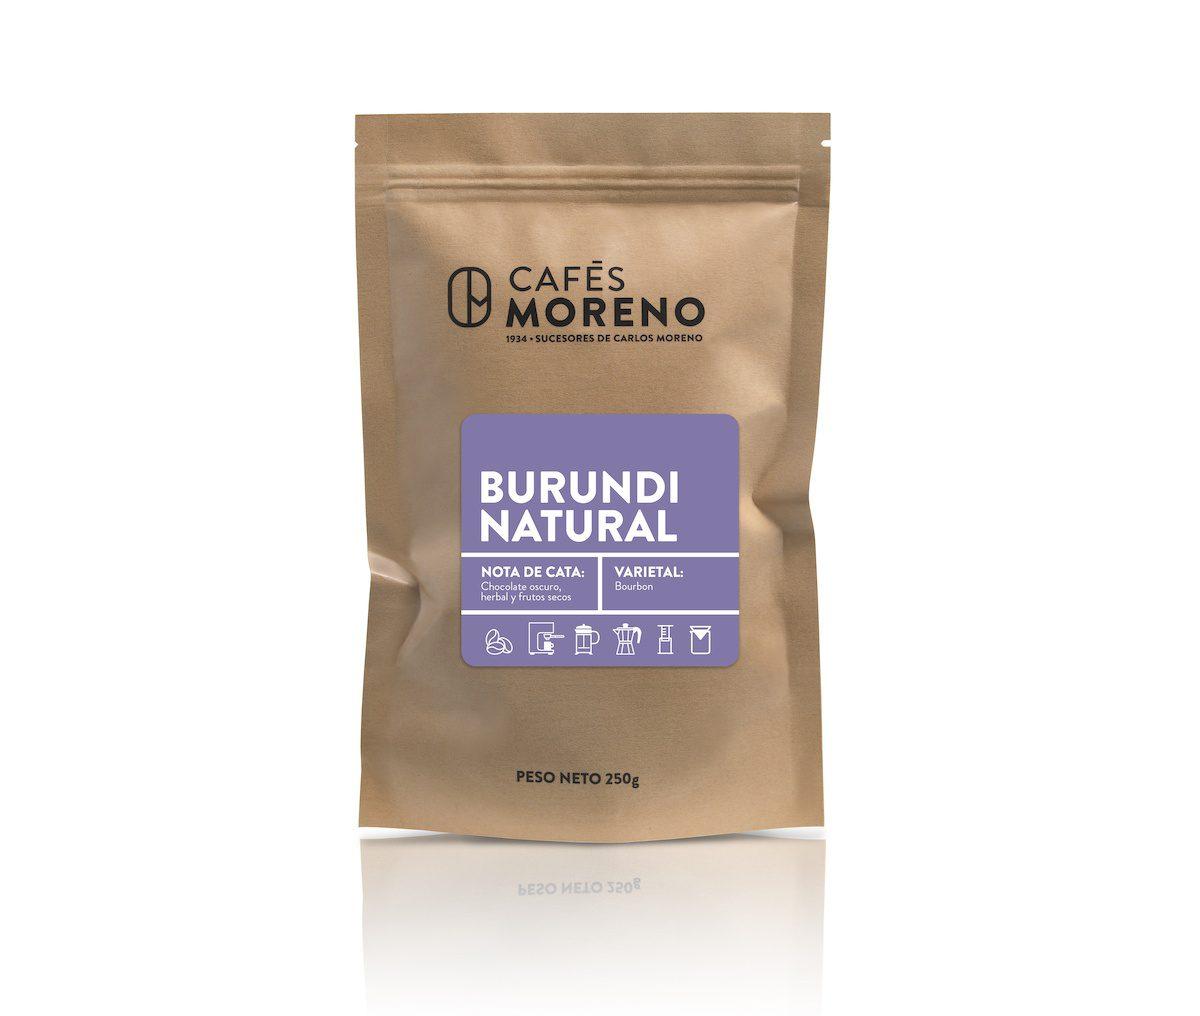 café Burundi natural cafes moreno